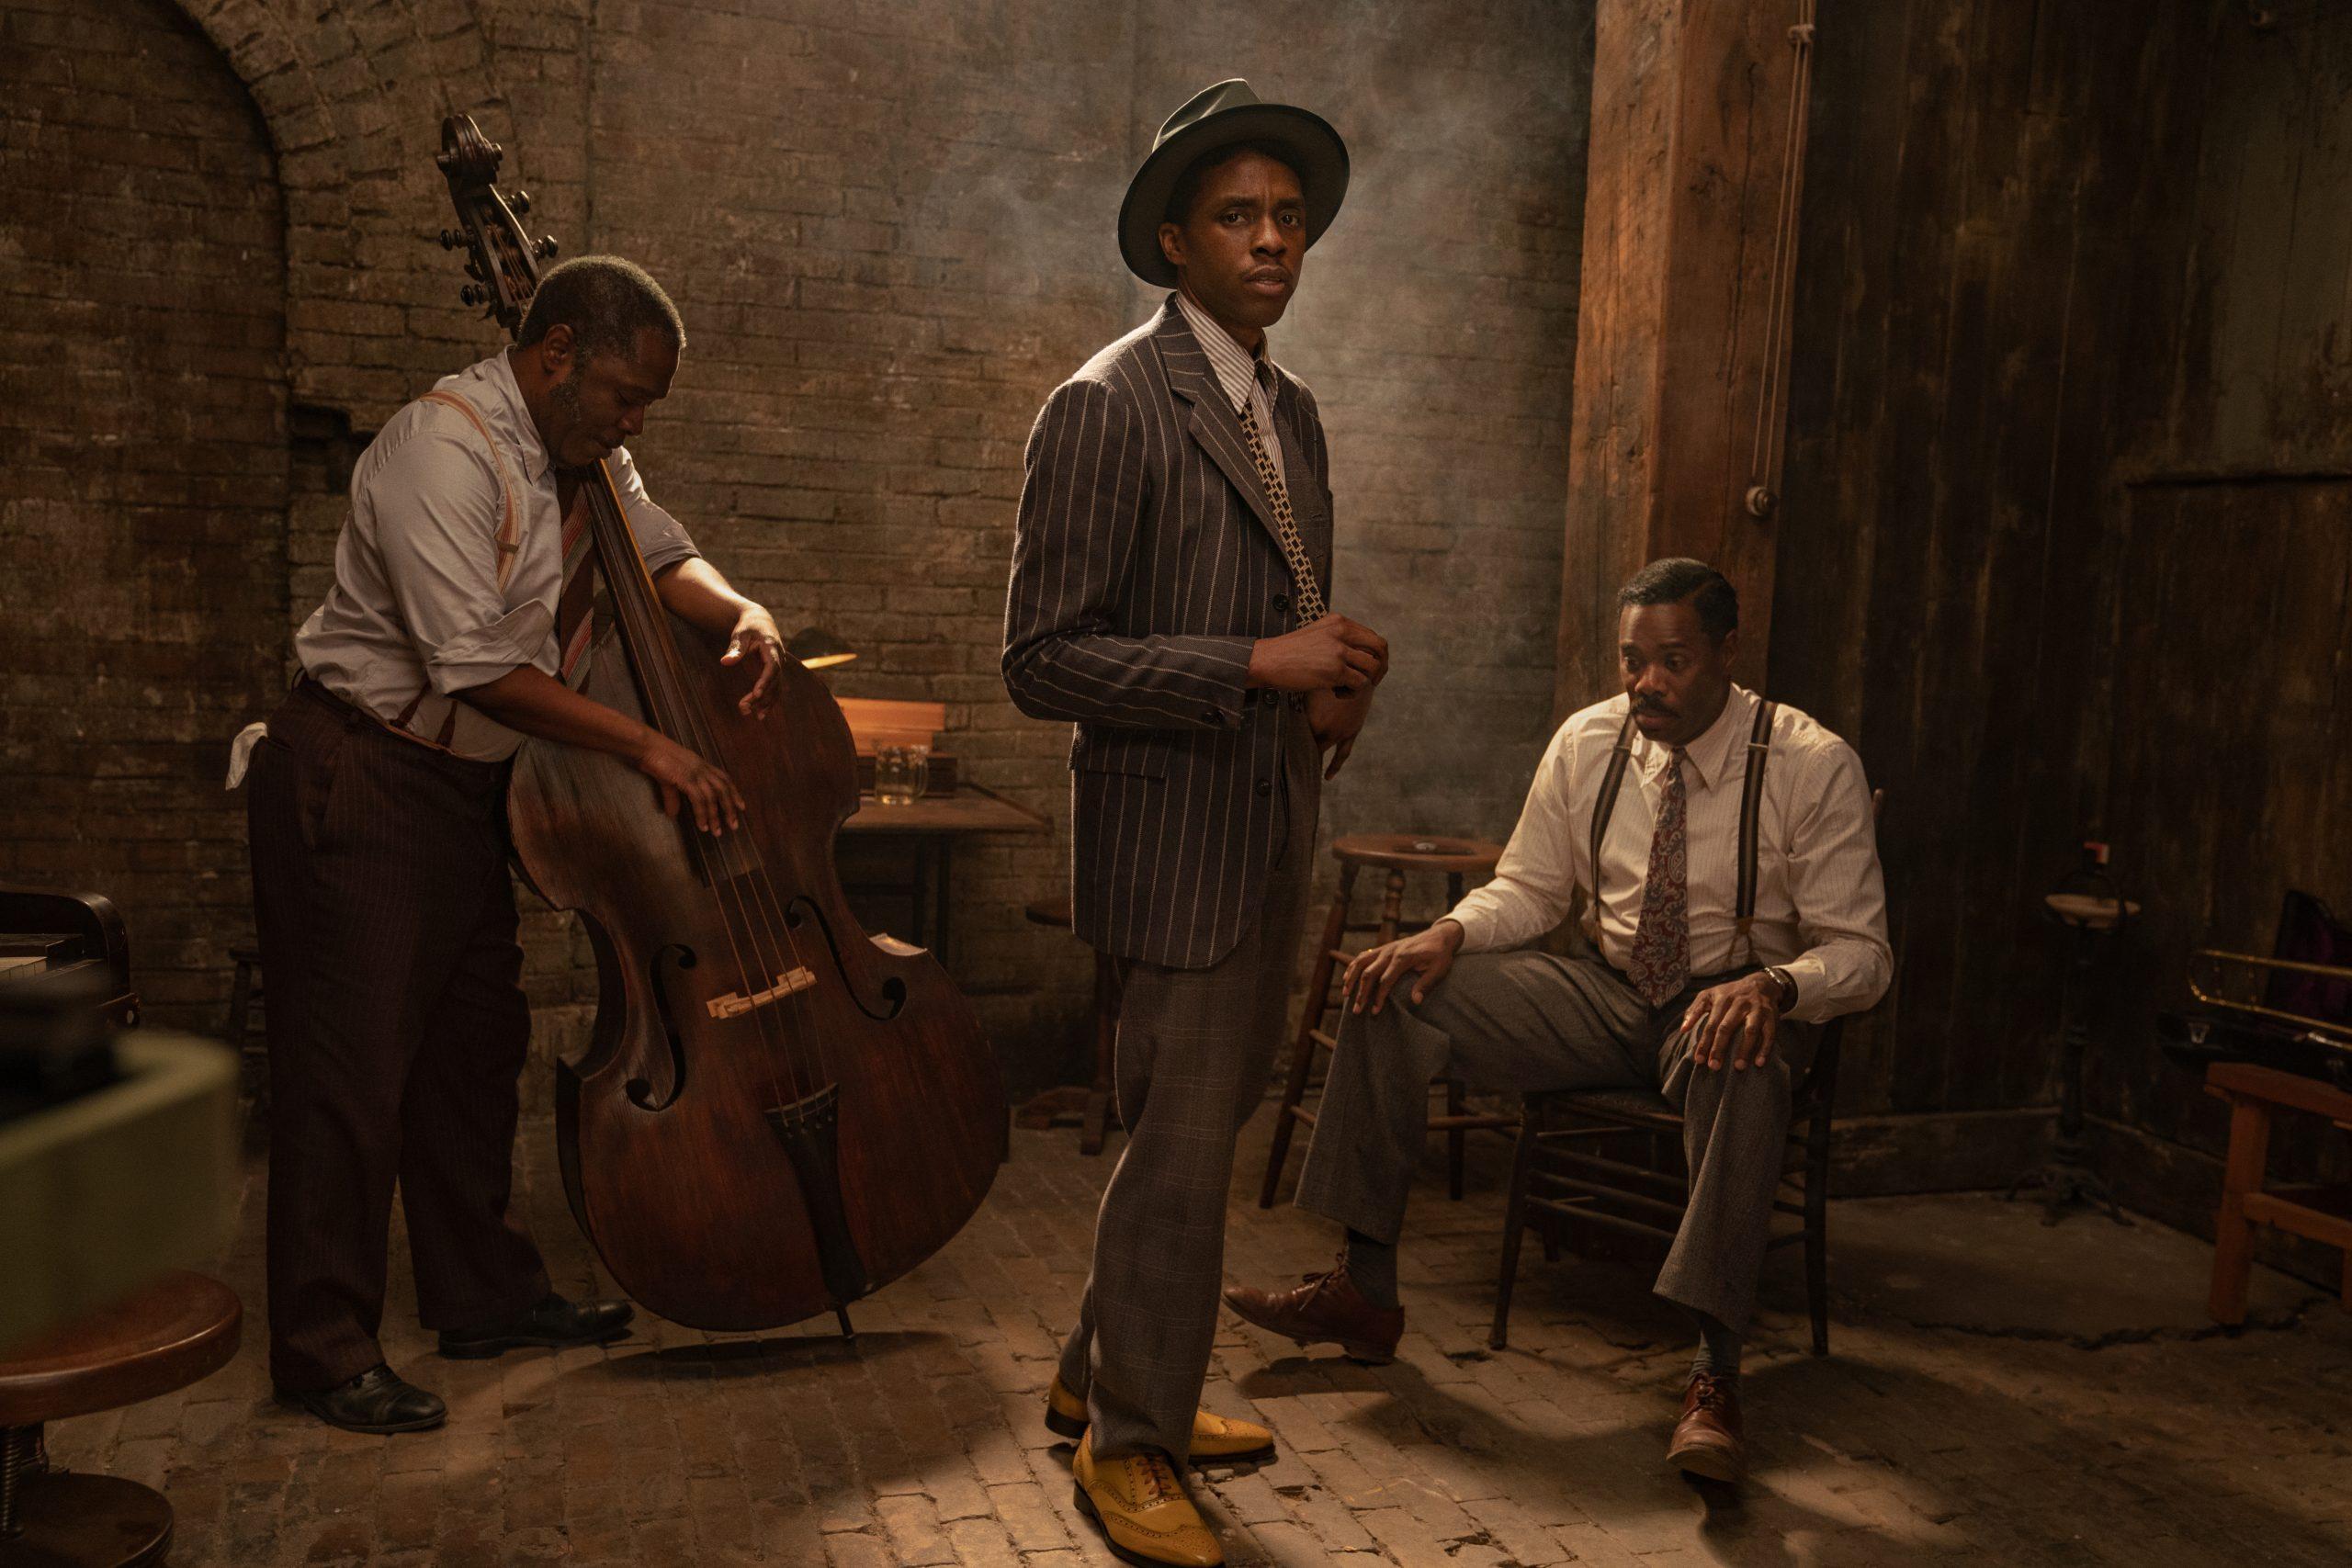 From left to right: Michael Potts, Chadwick Boseman and Colman Domingo in 'Ma Rainey's Black Bottom' on Netflix. (David Lee / Netflix)